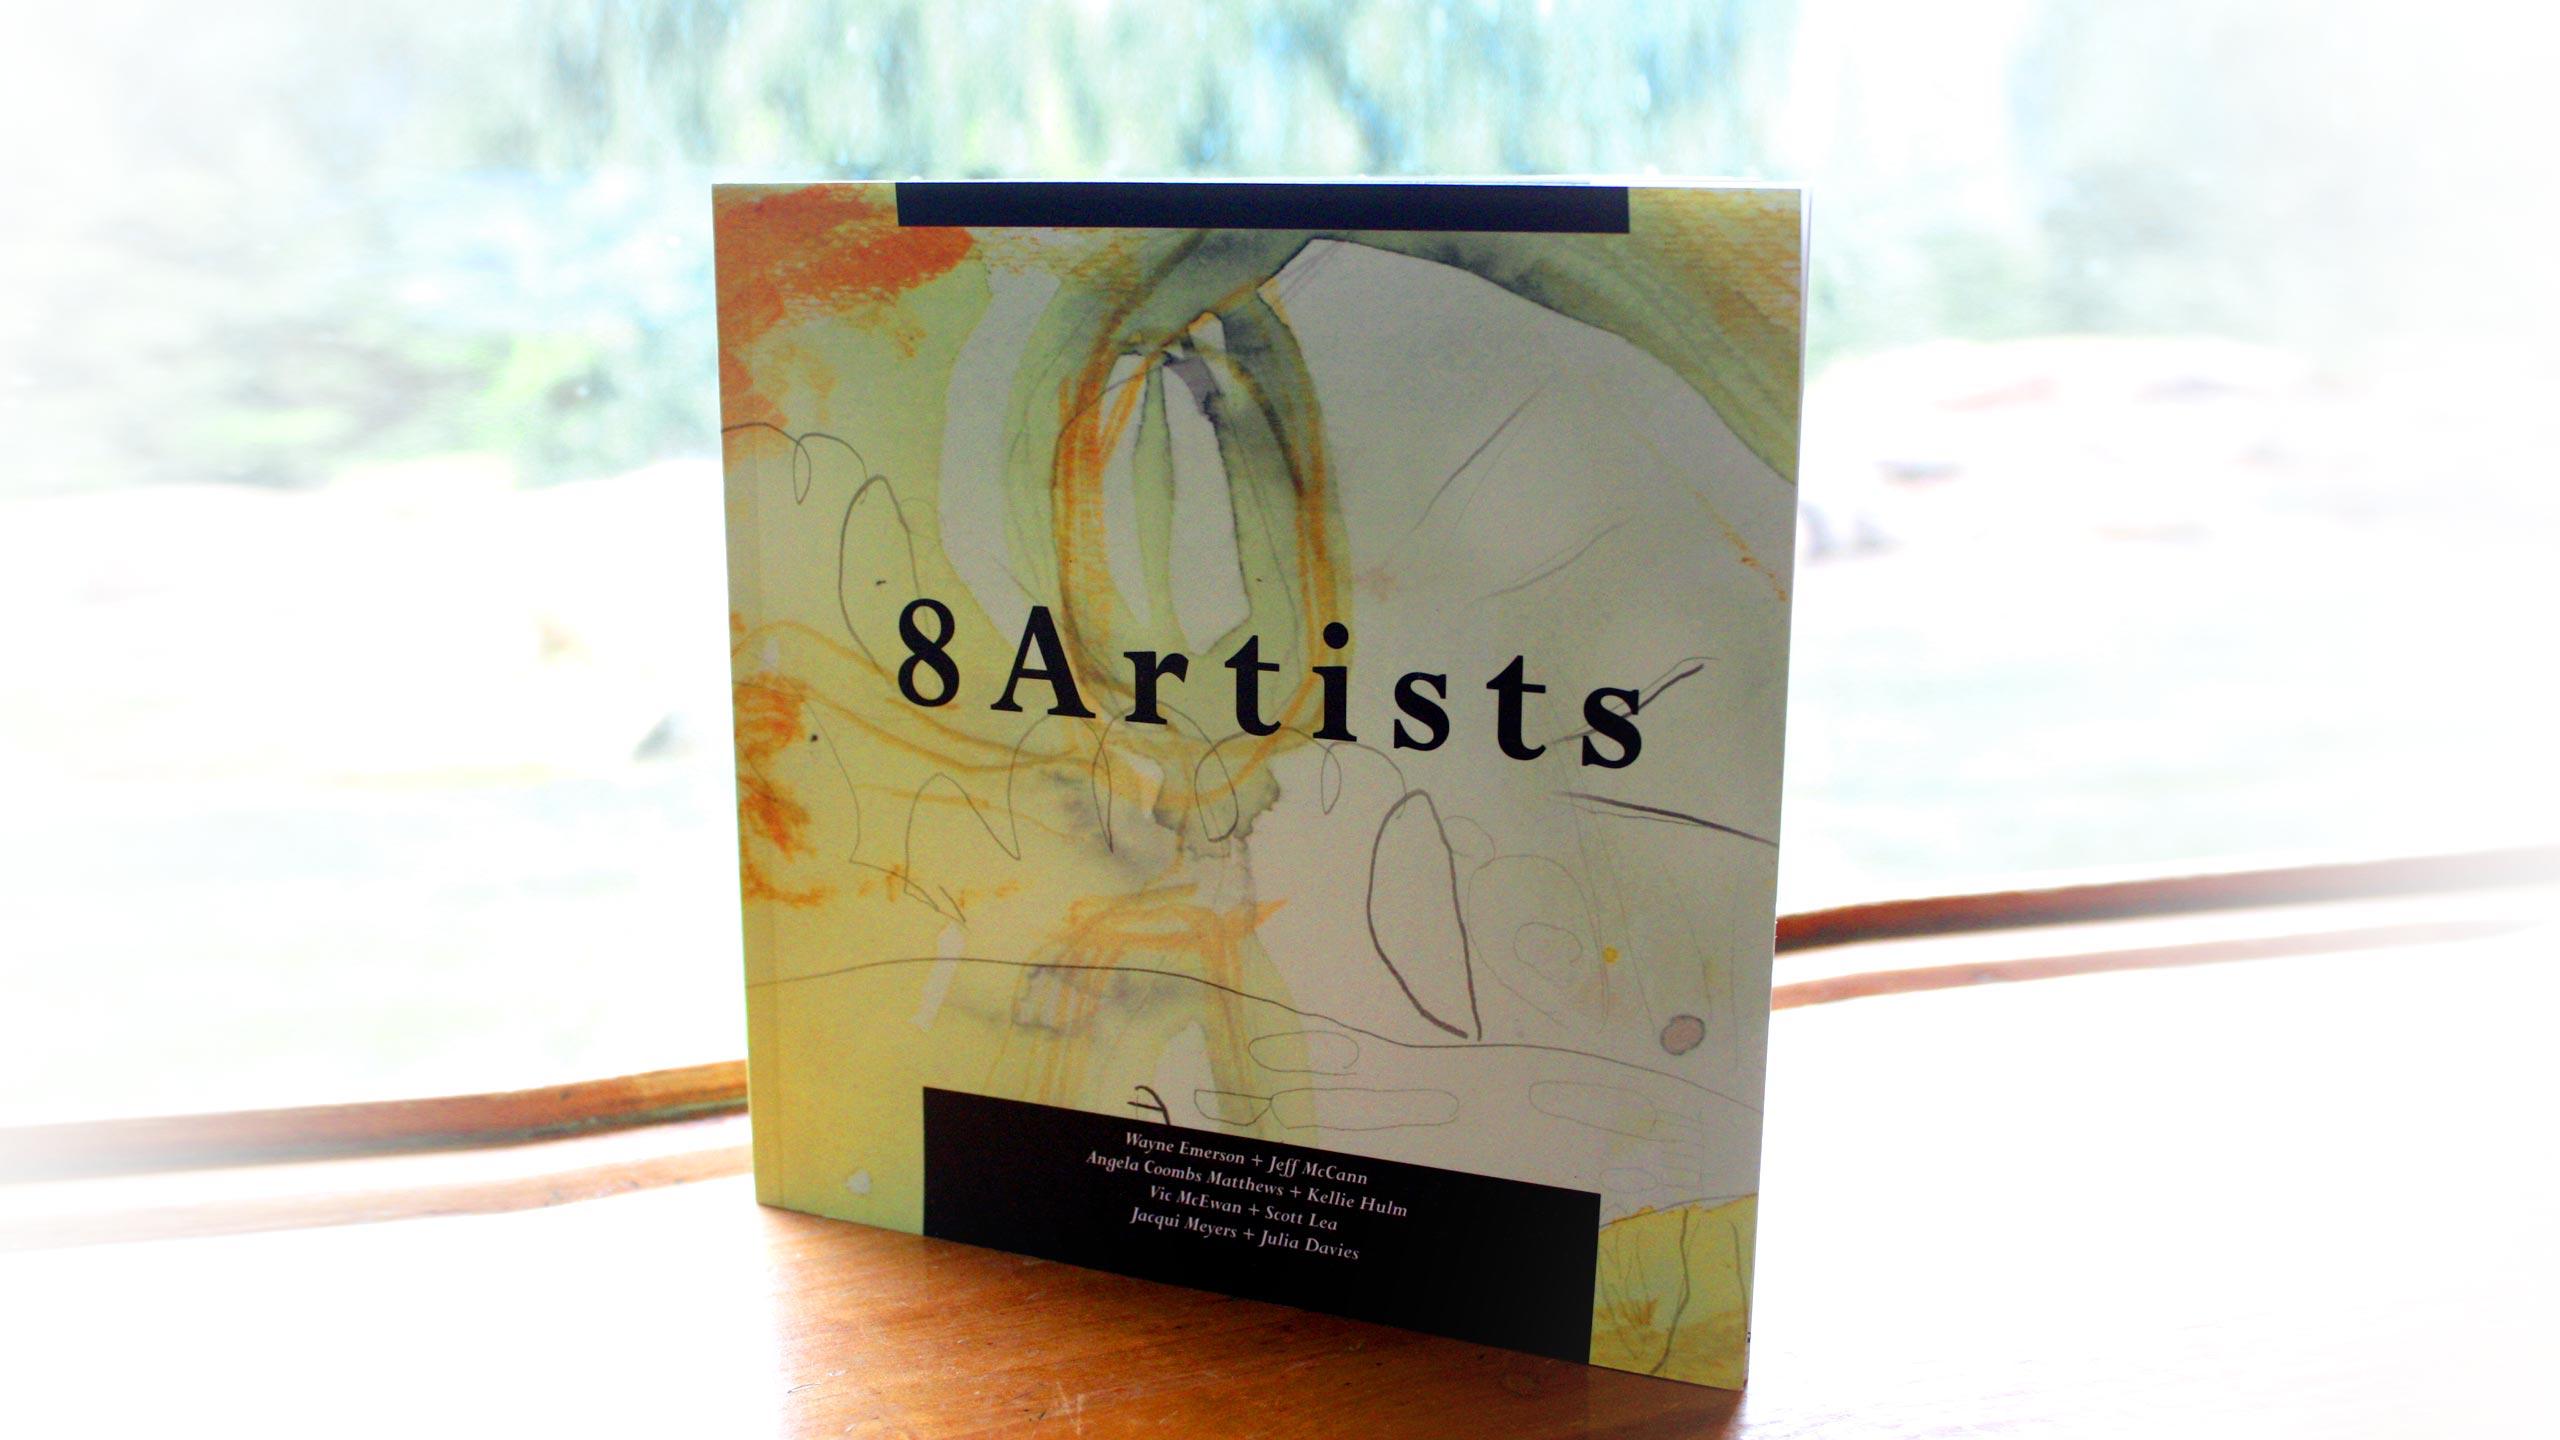 8 Artists